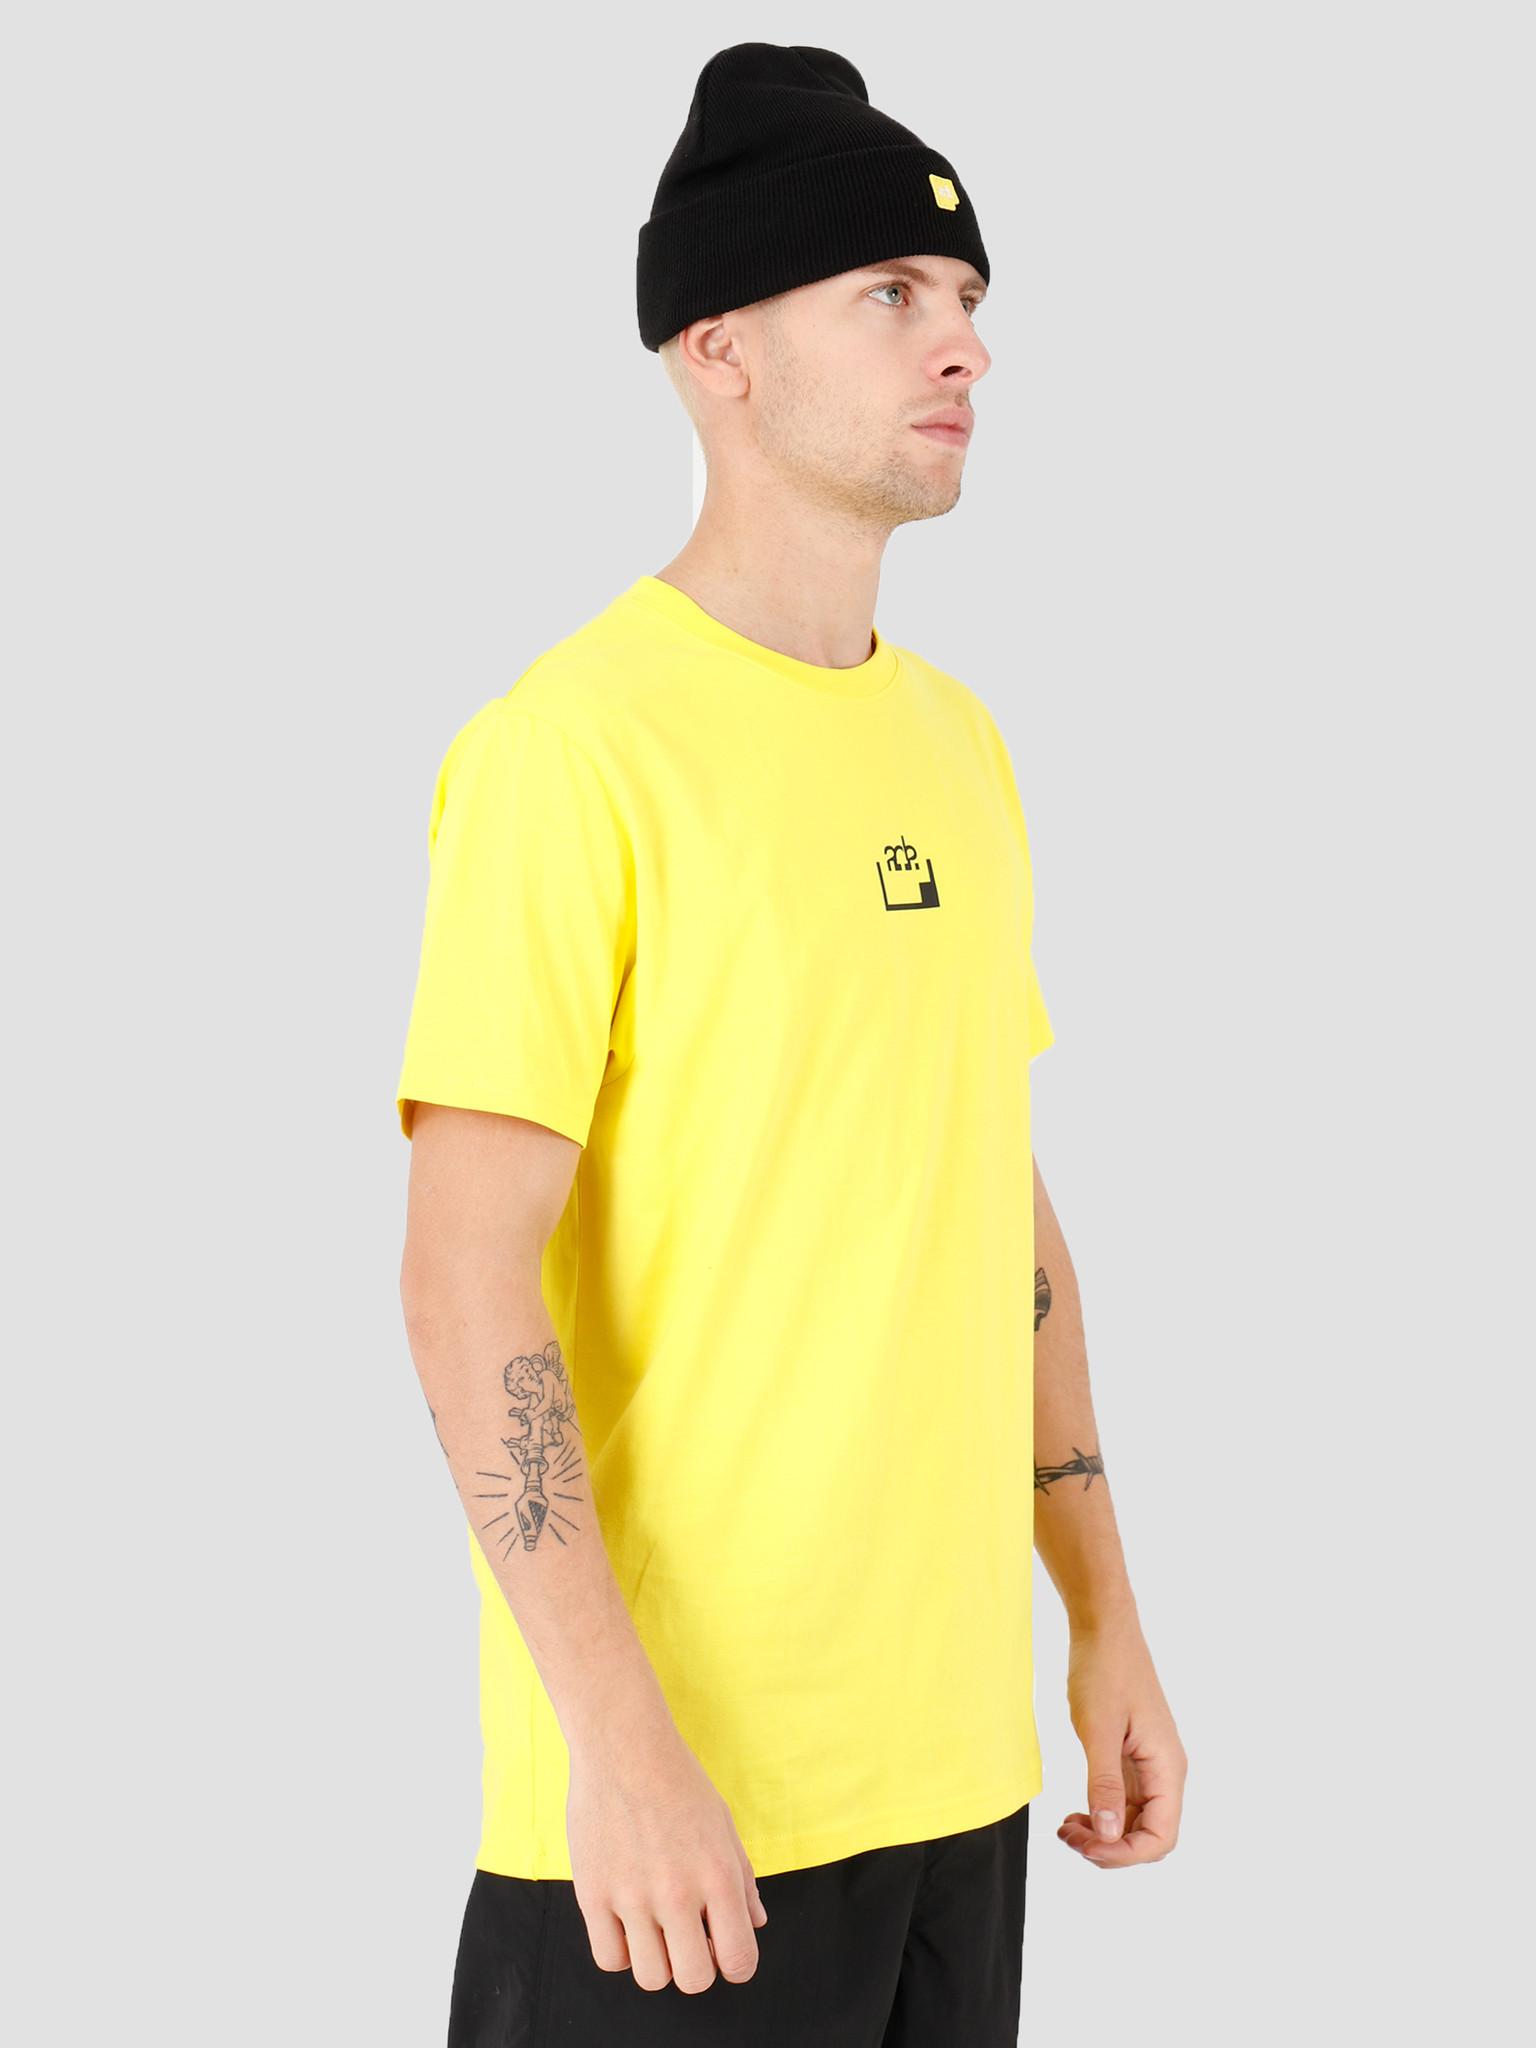 FRESHCOTTON x ADE FRESHCOTTON x ADE Printed T-shirt Yellow